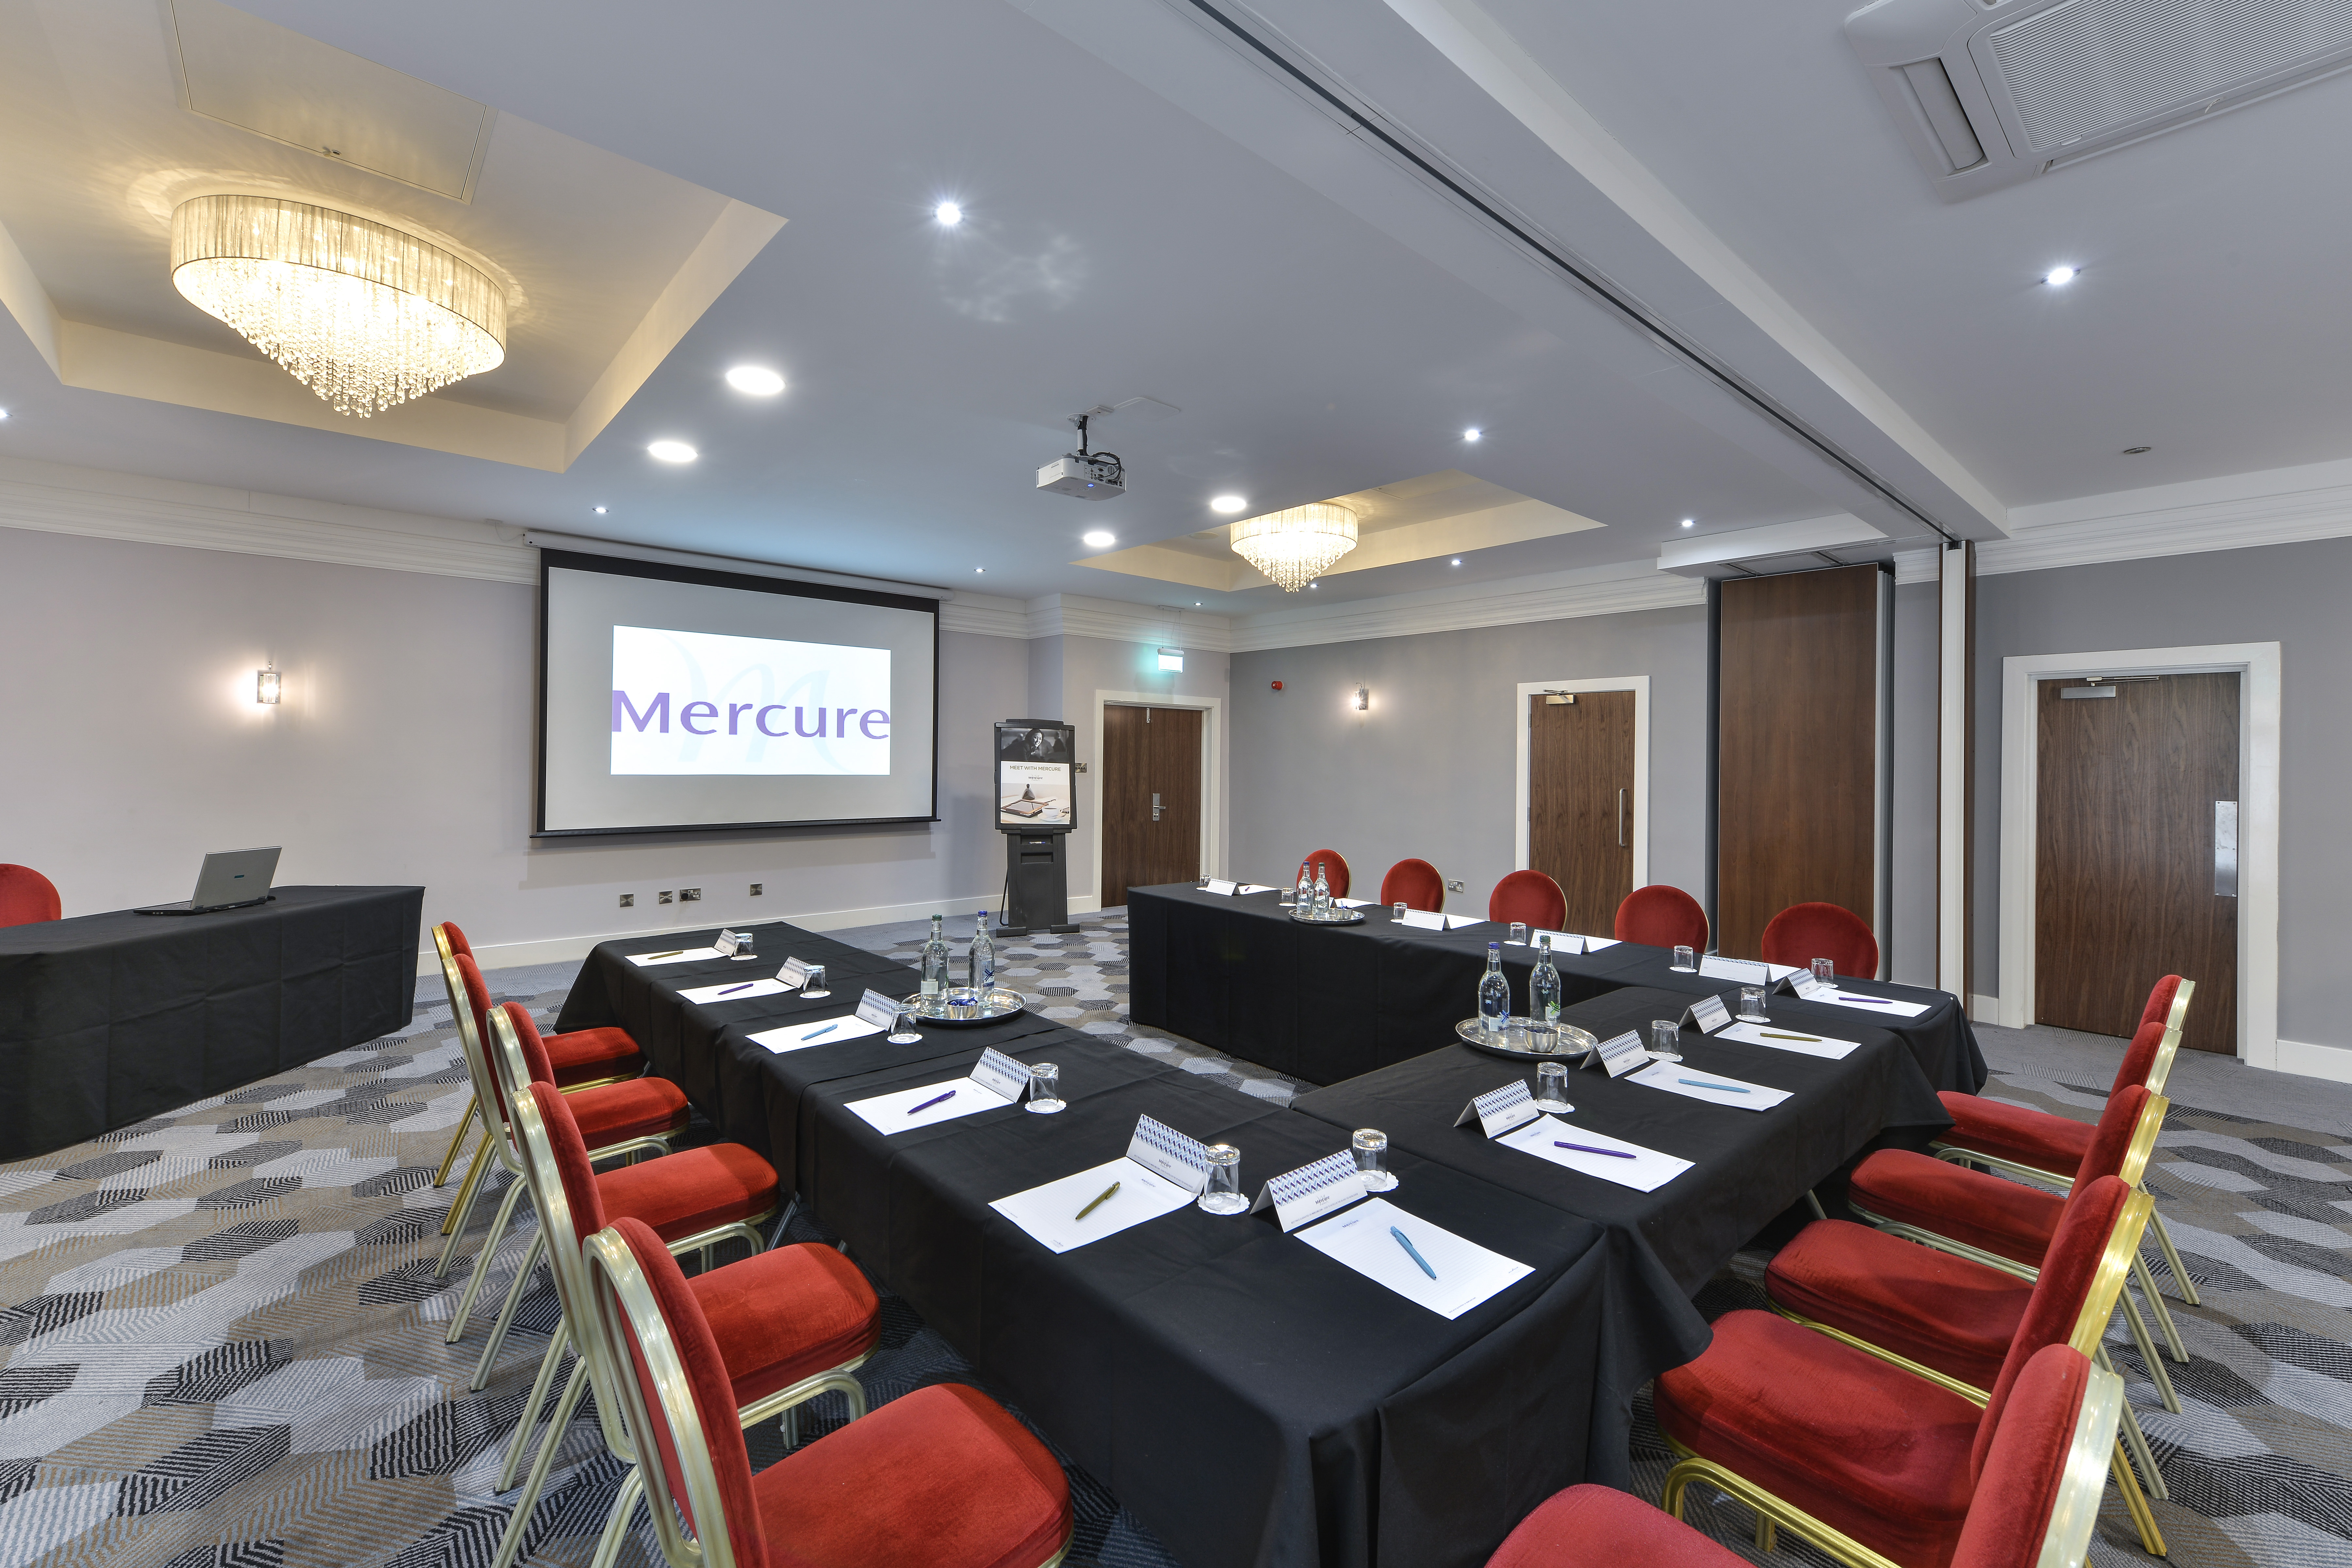 mercure_norton_grange_hotel_manchester